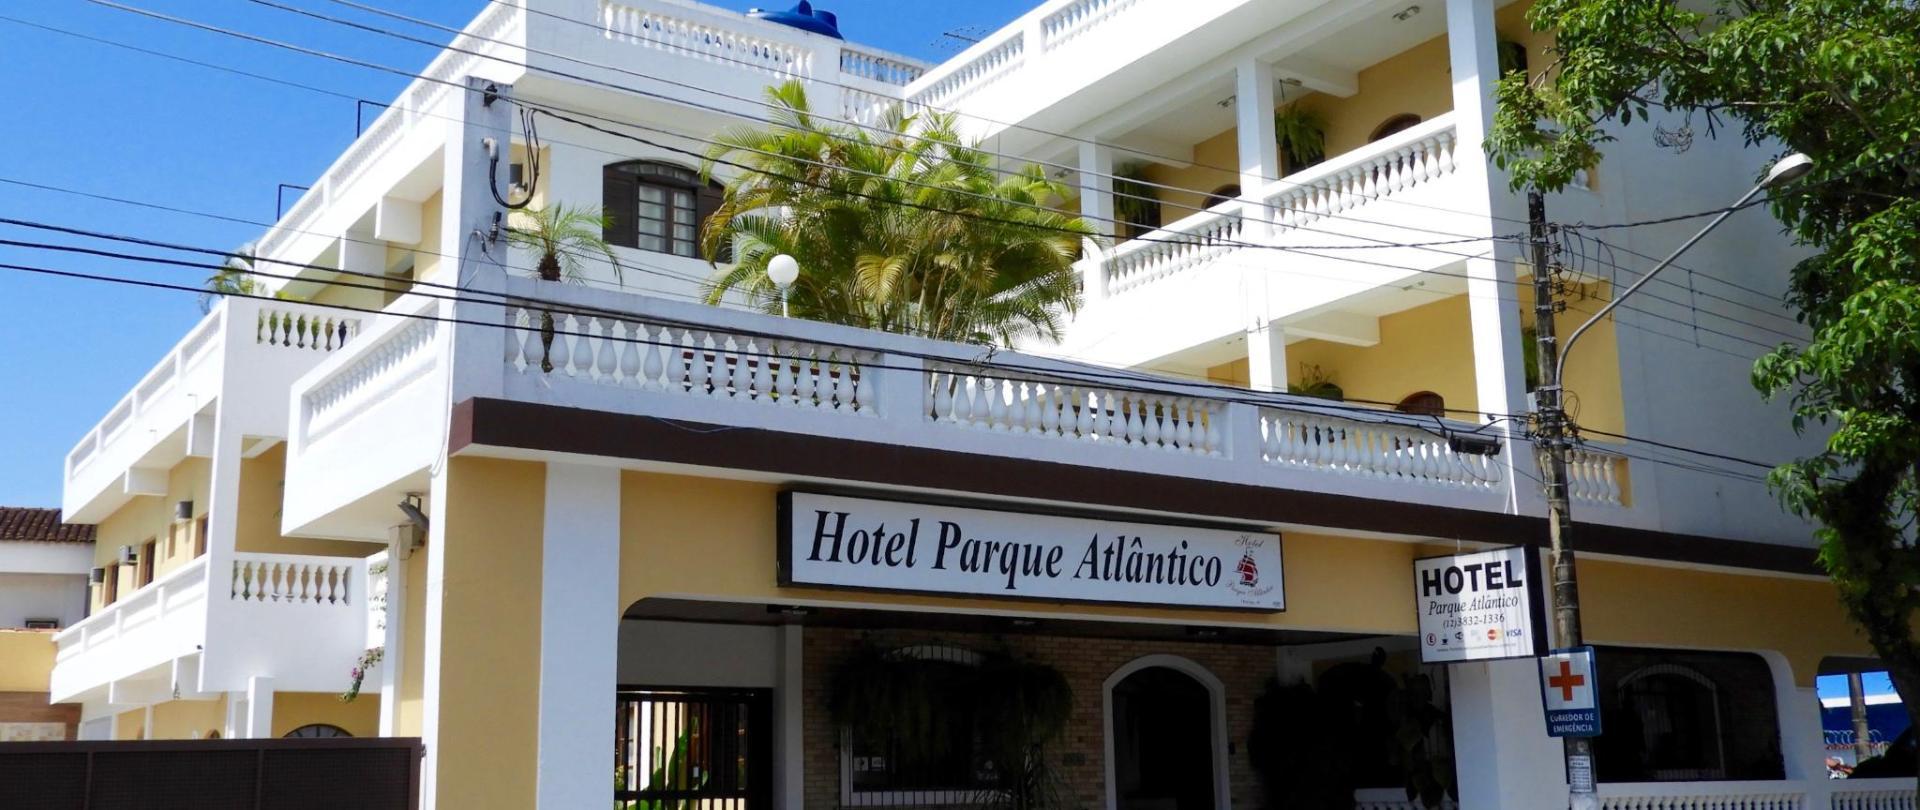 Hotel Parque Atlântico